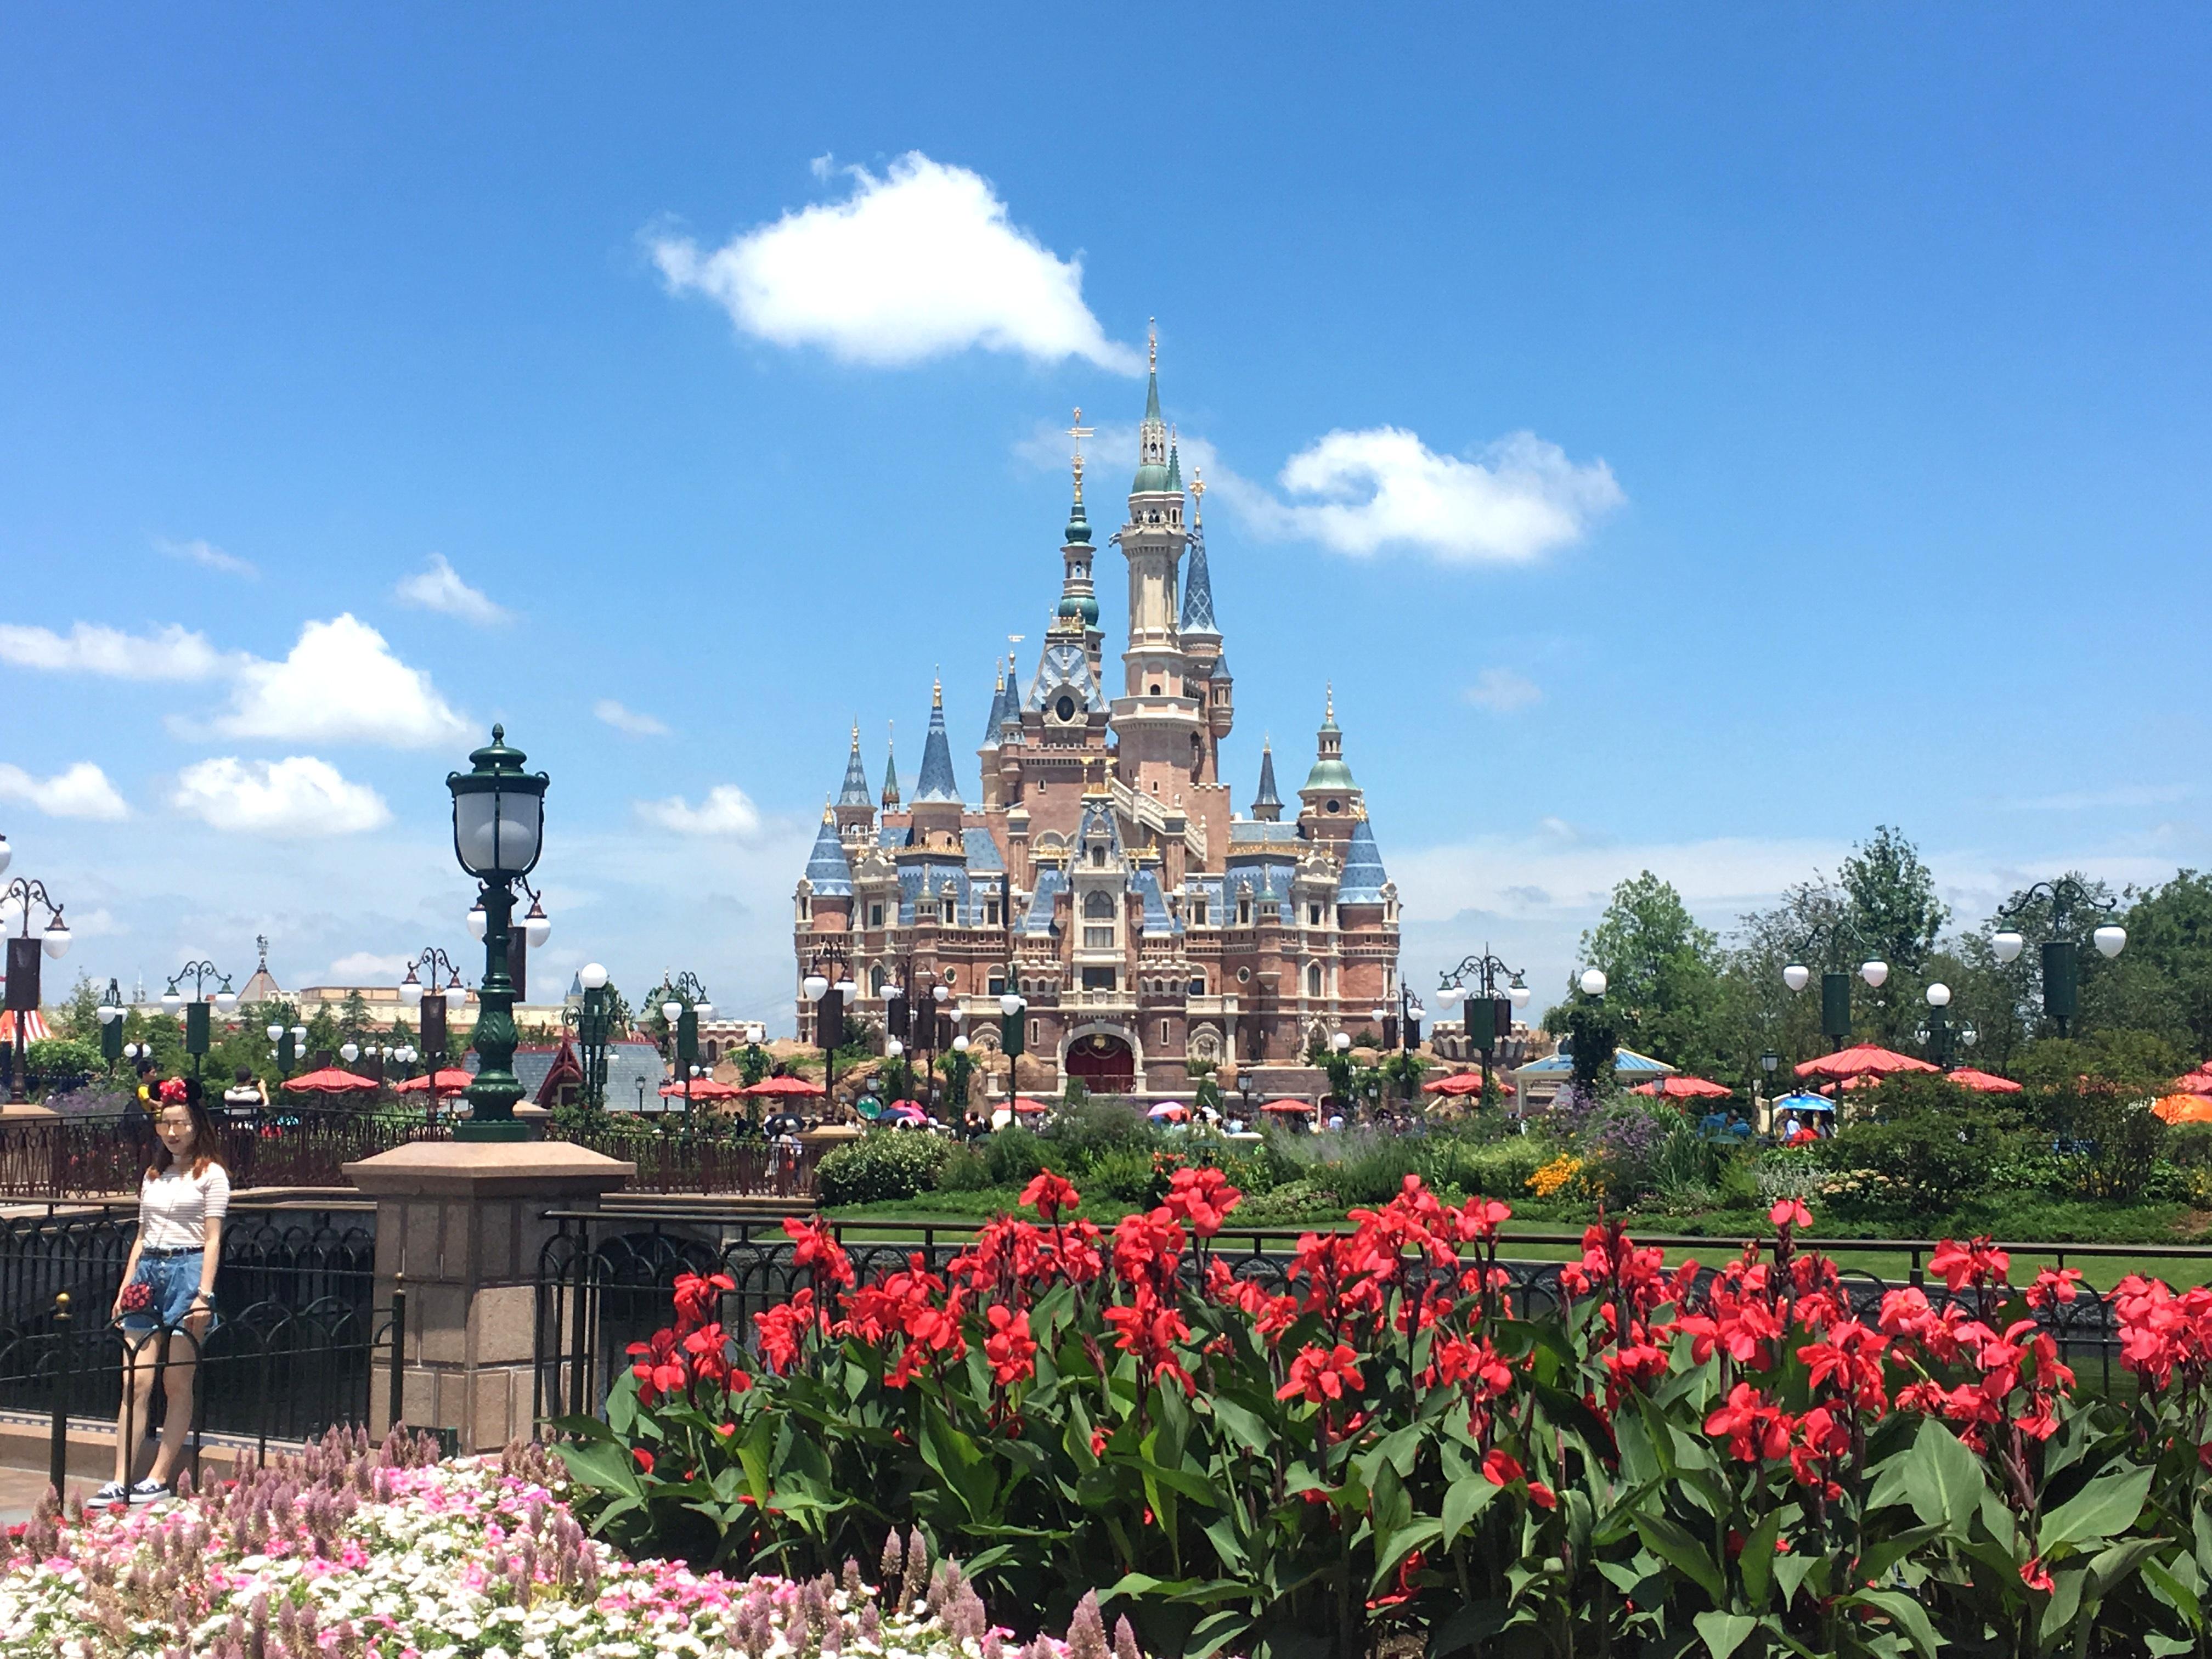 shanghai-disneyland-castle-1